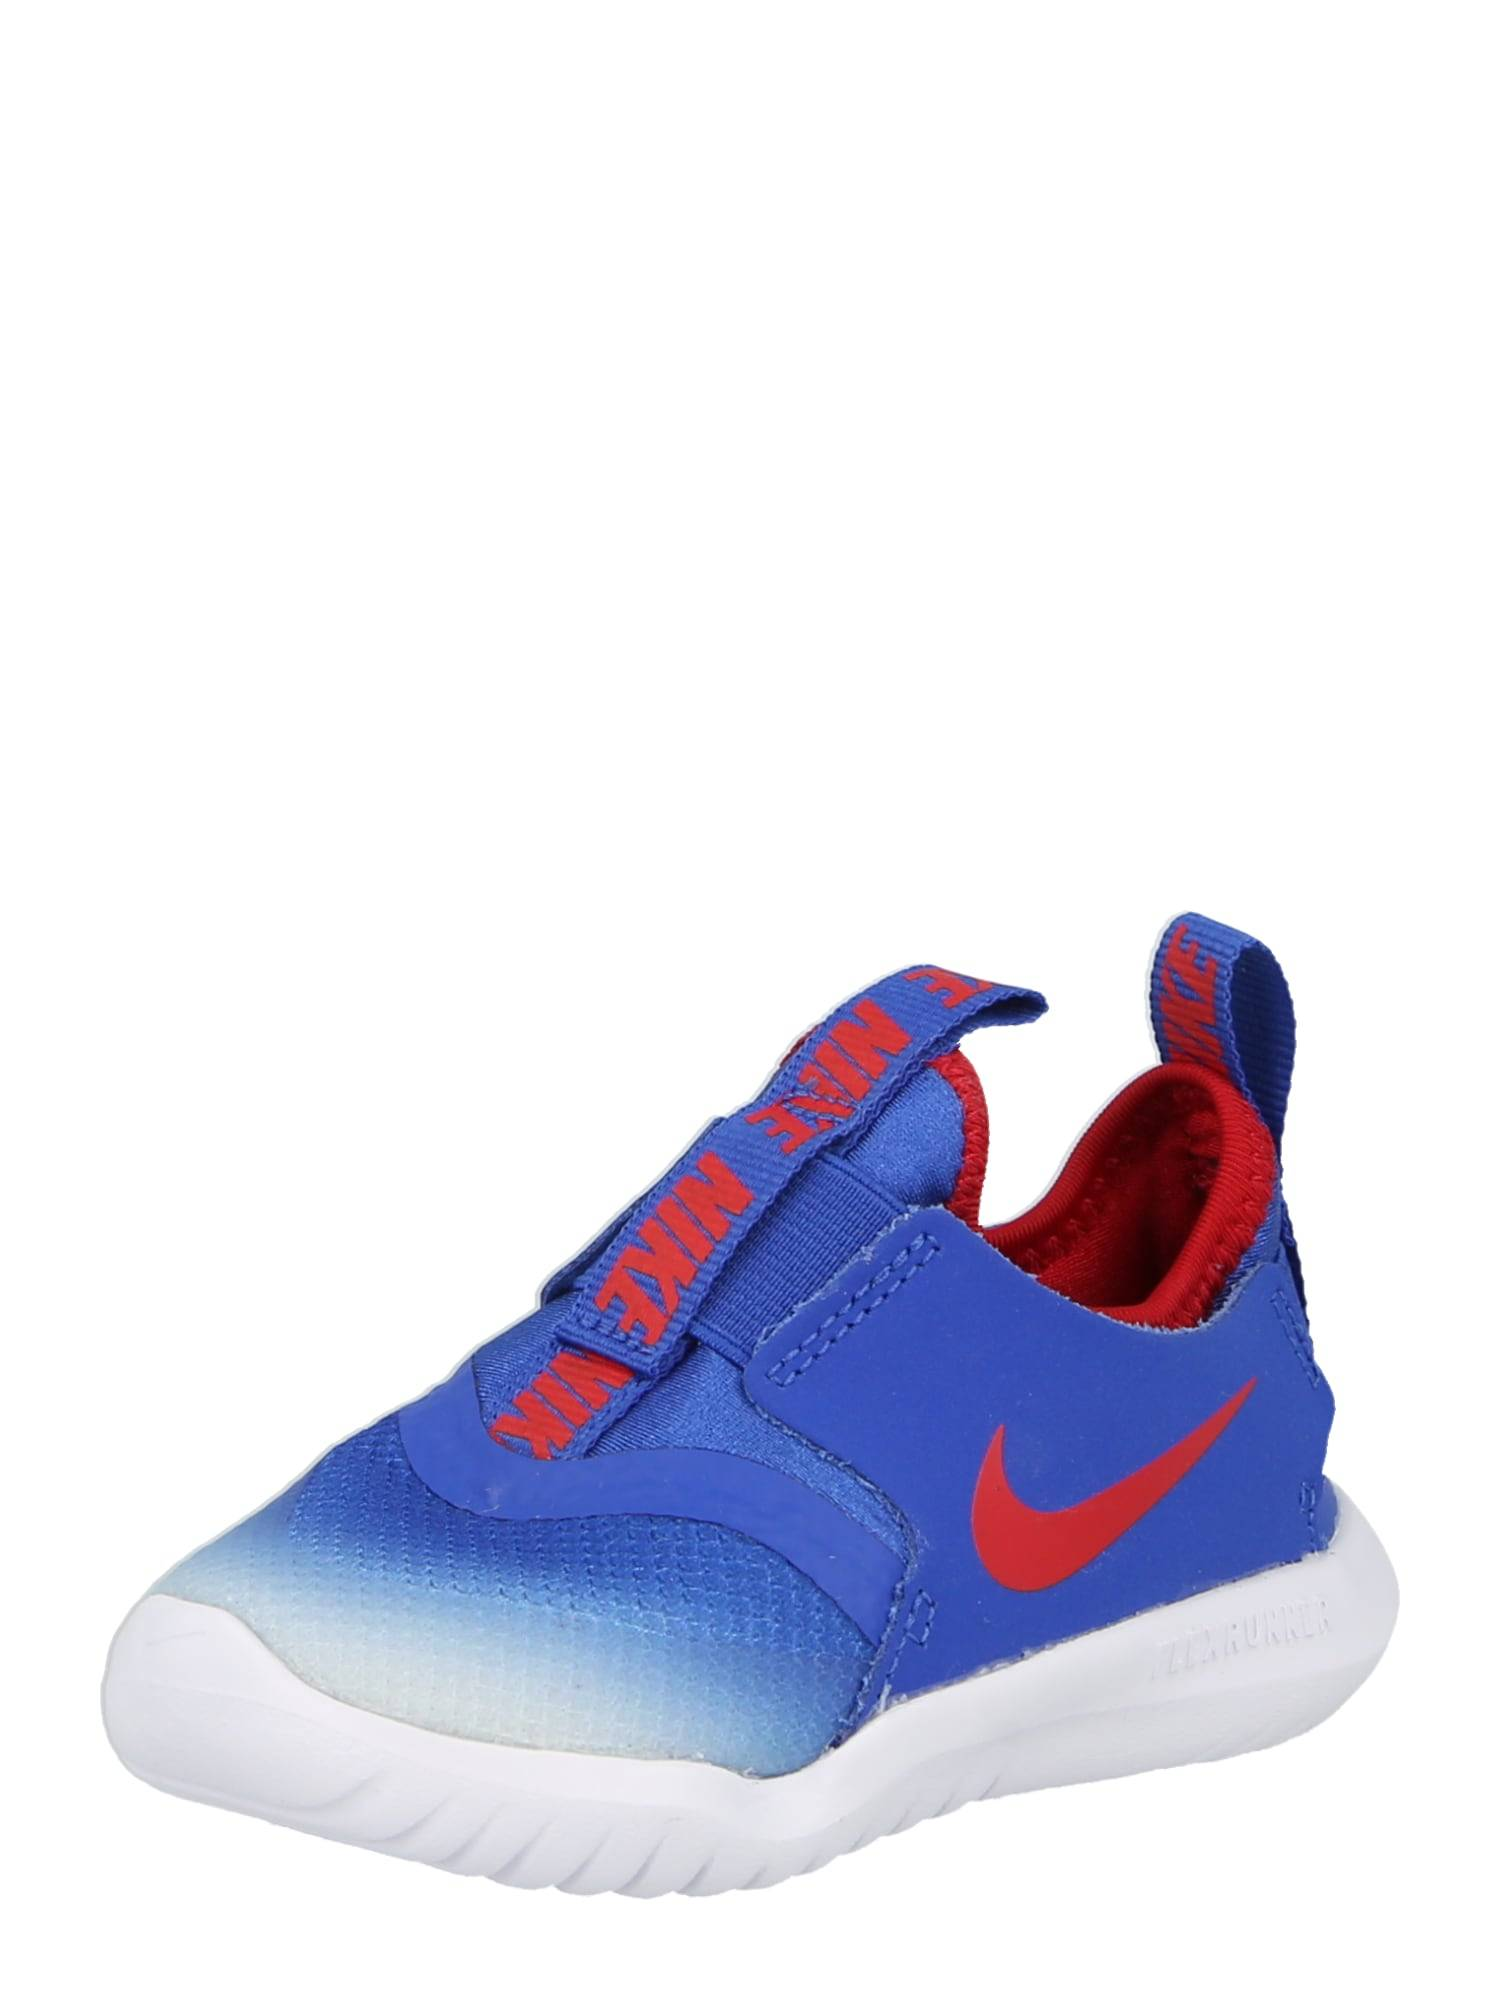 NIKE Scarpa sportiva 'Flex Runner' Blu